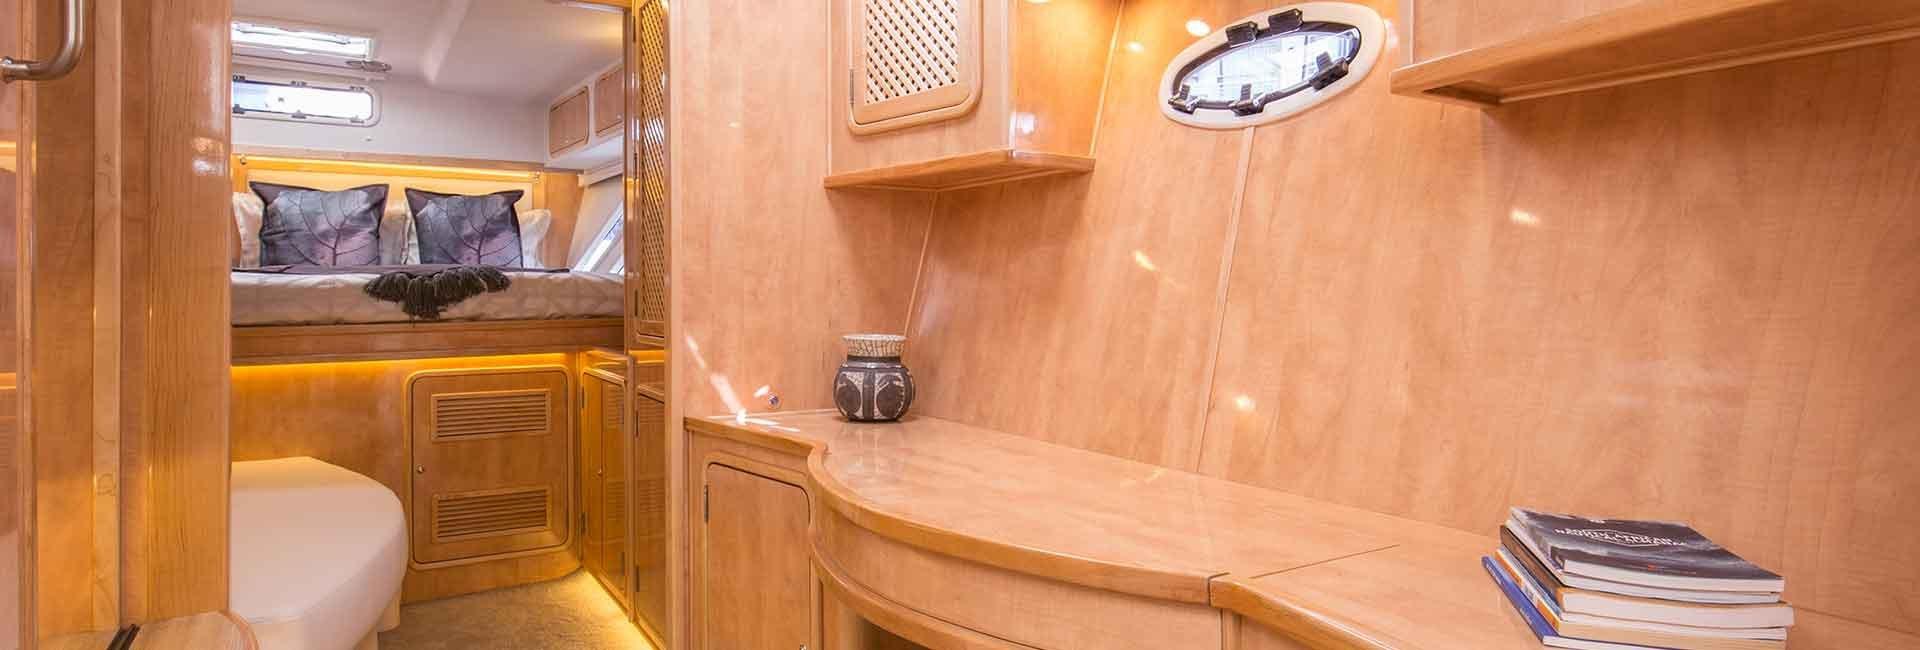 Inside a yacht